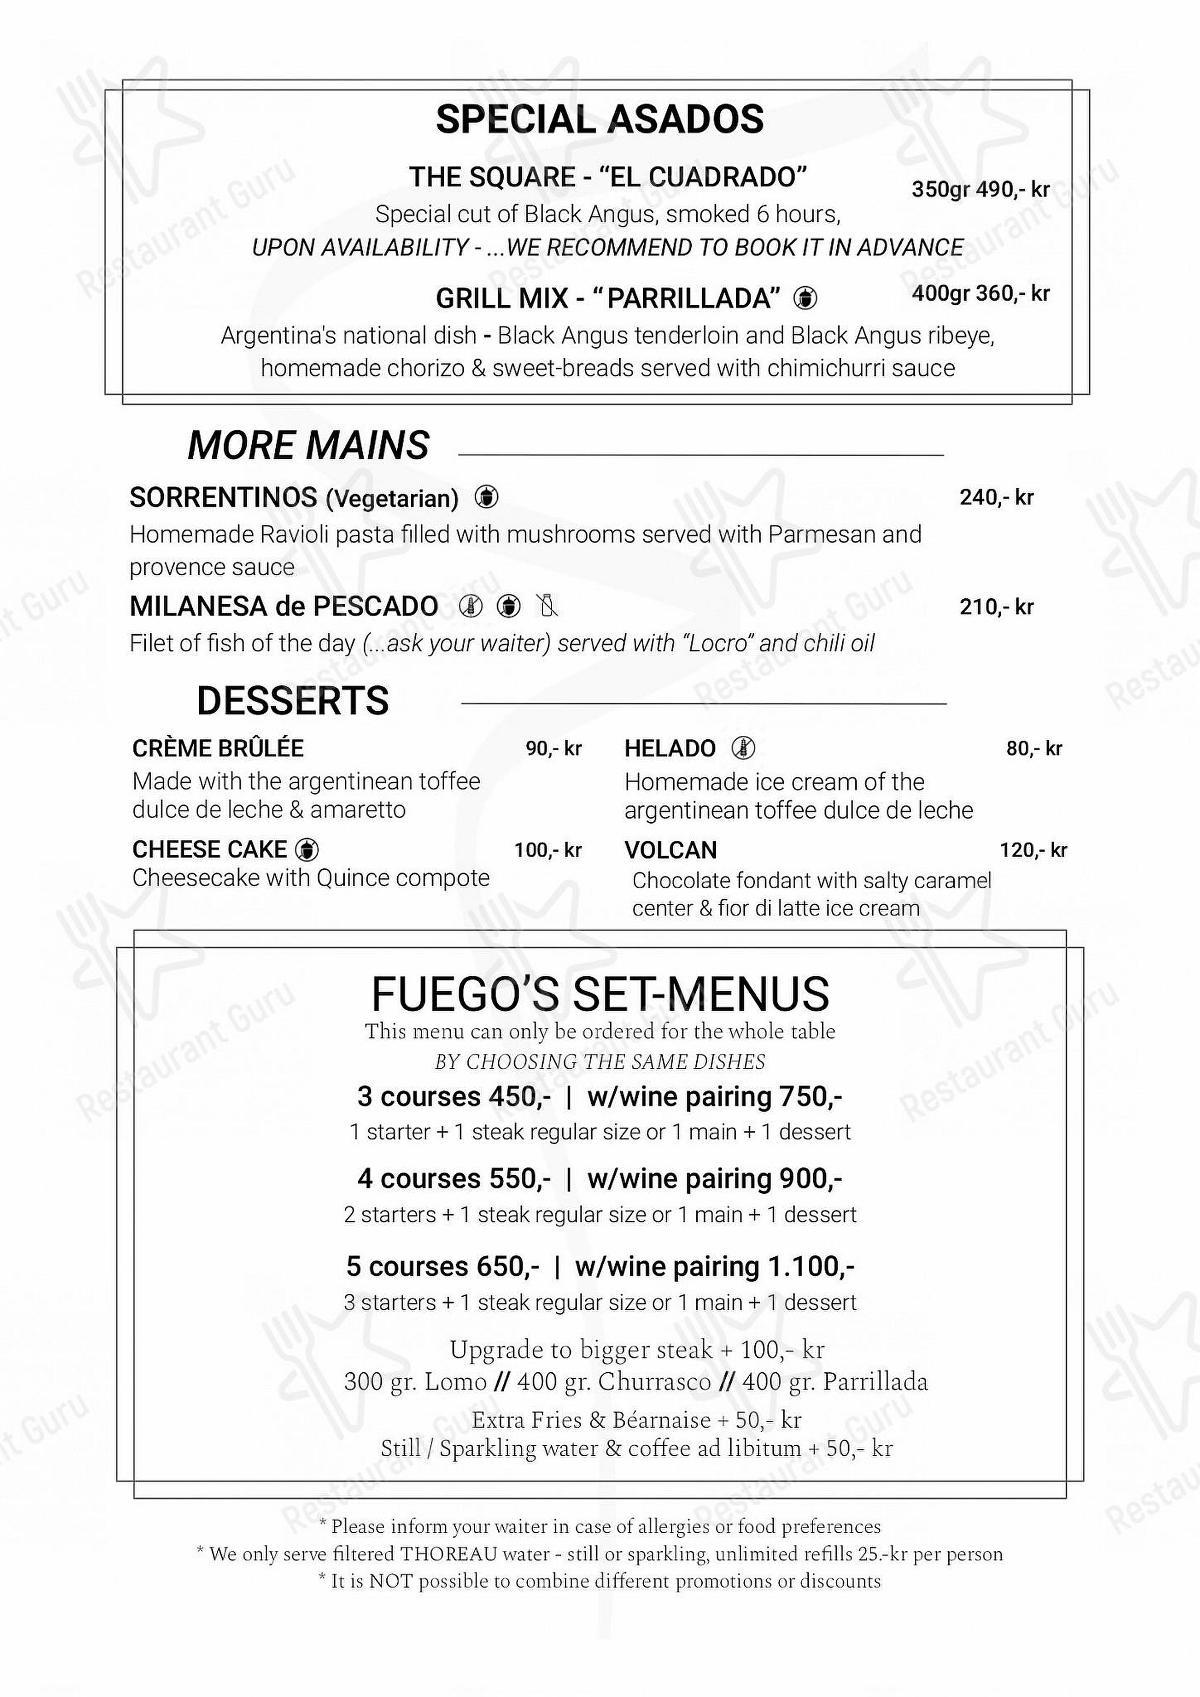 Fuego menu - meals and drinks